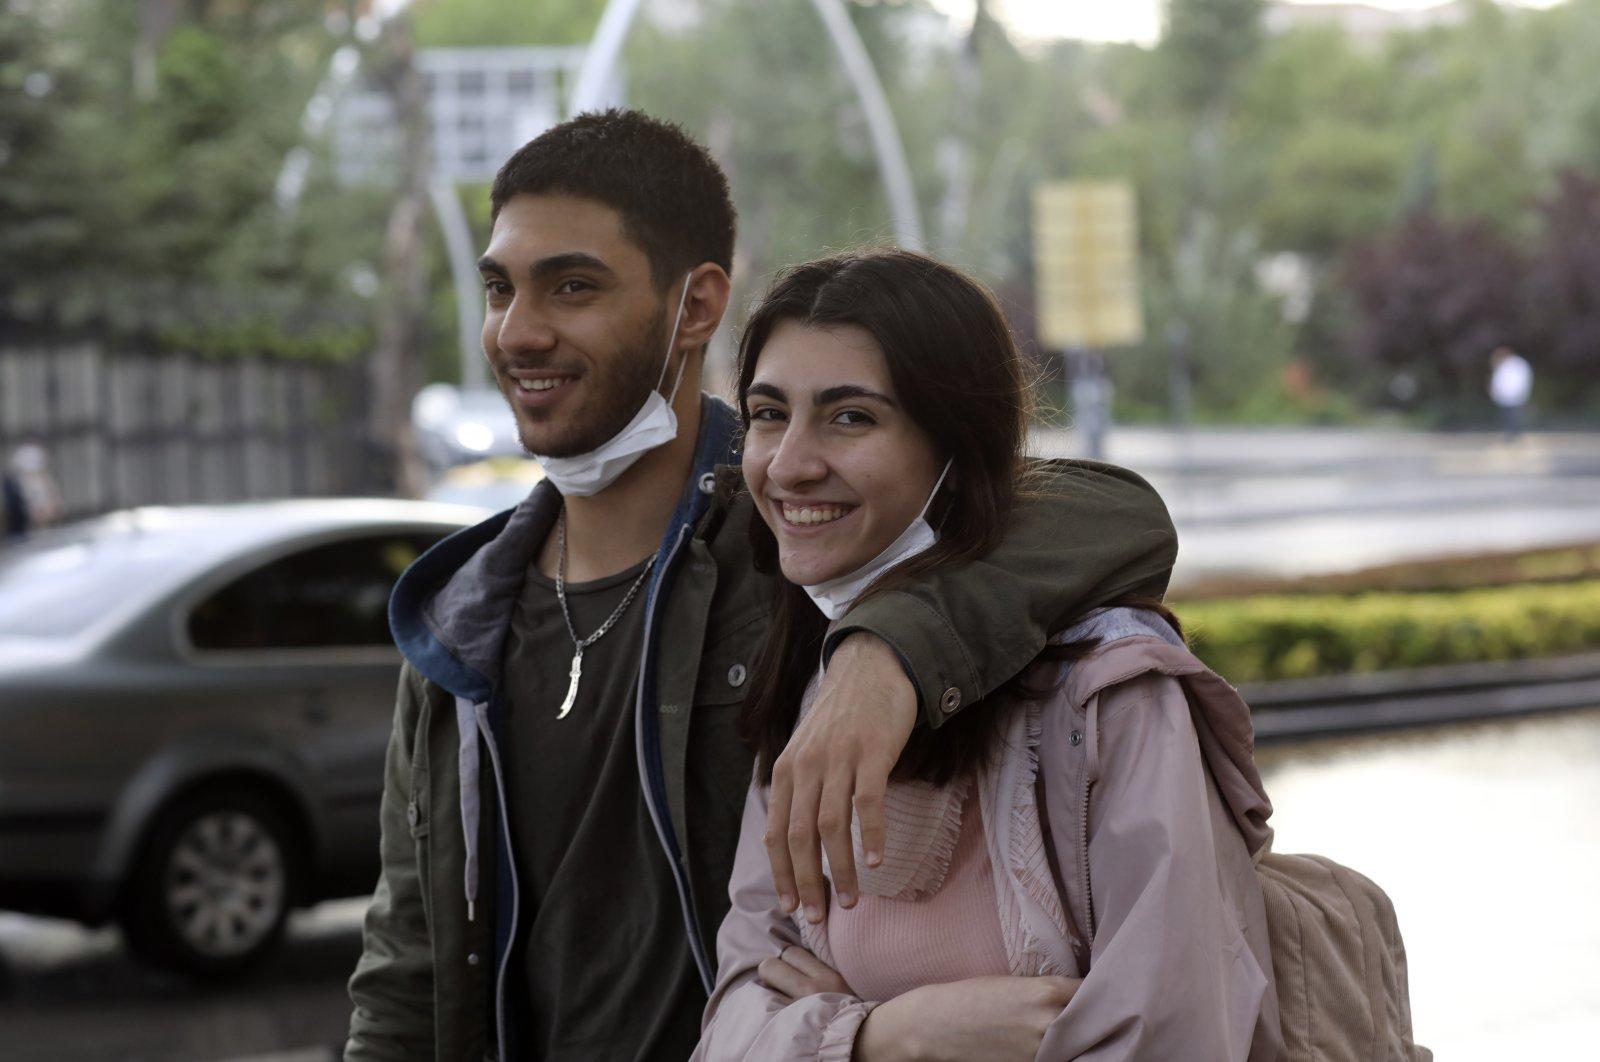 A couple not wearing their masks properly walks in a popular street, in Ankara, Turkey, June 17, 2020. (AP Photo)